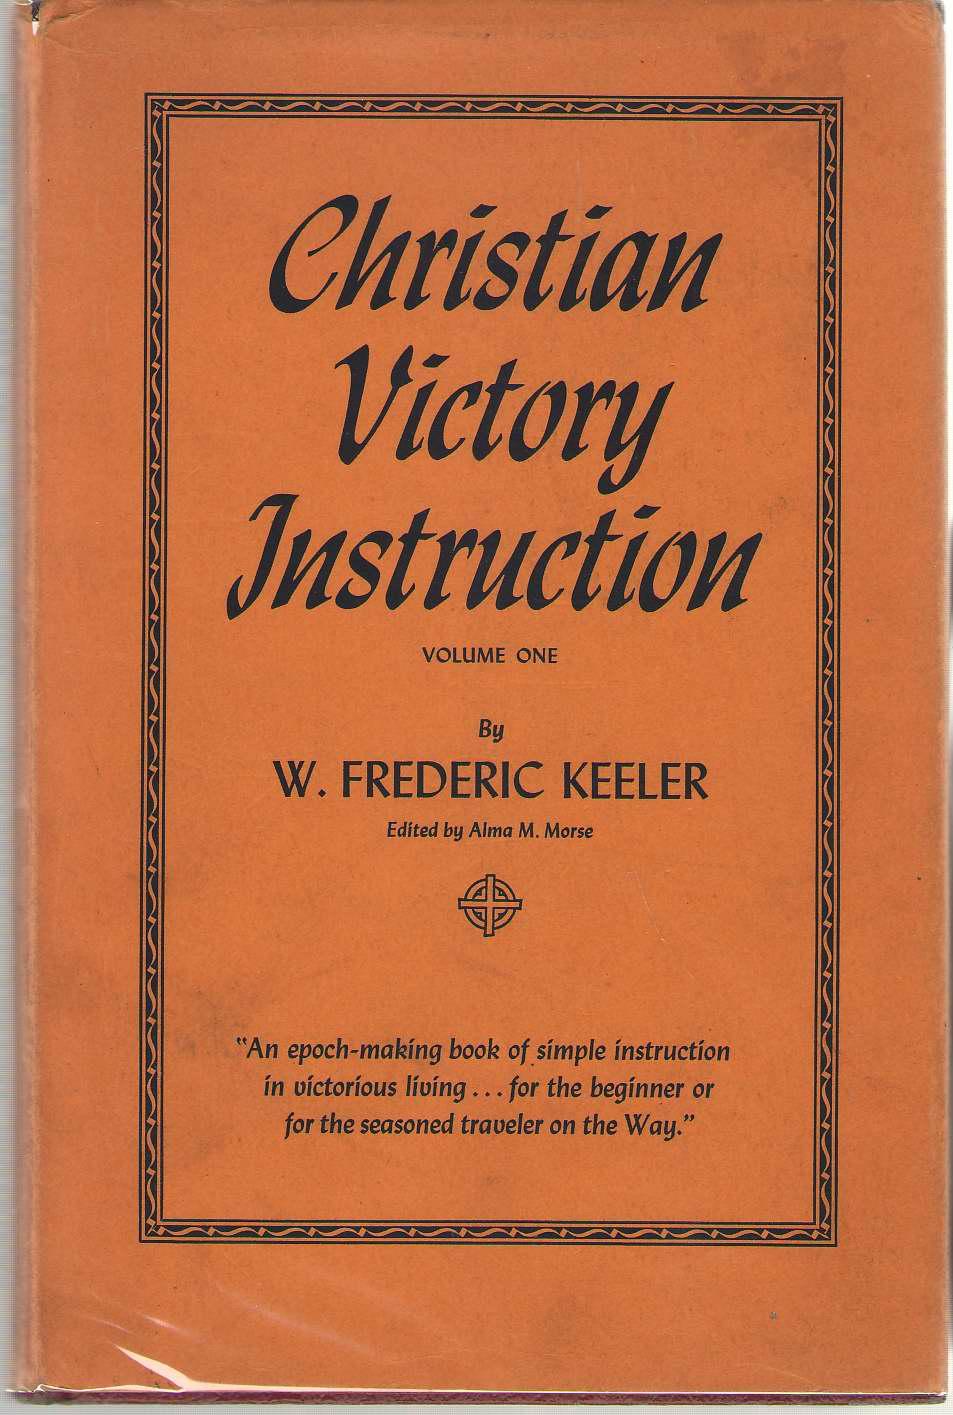 Christian Victory Instruction, V.1, Keeler, William Frederick